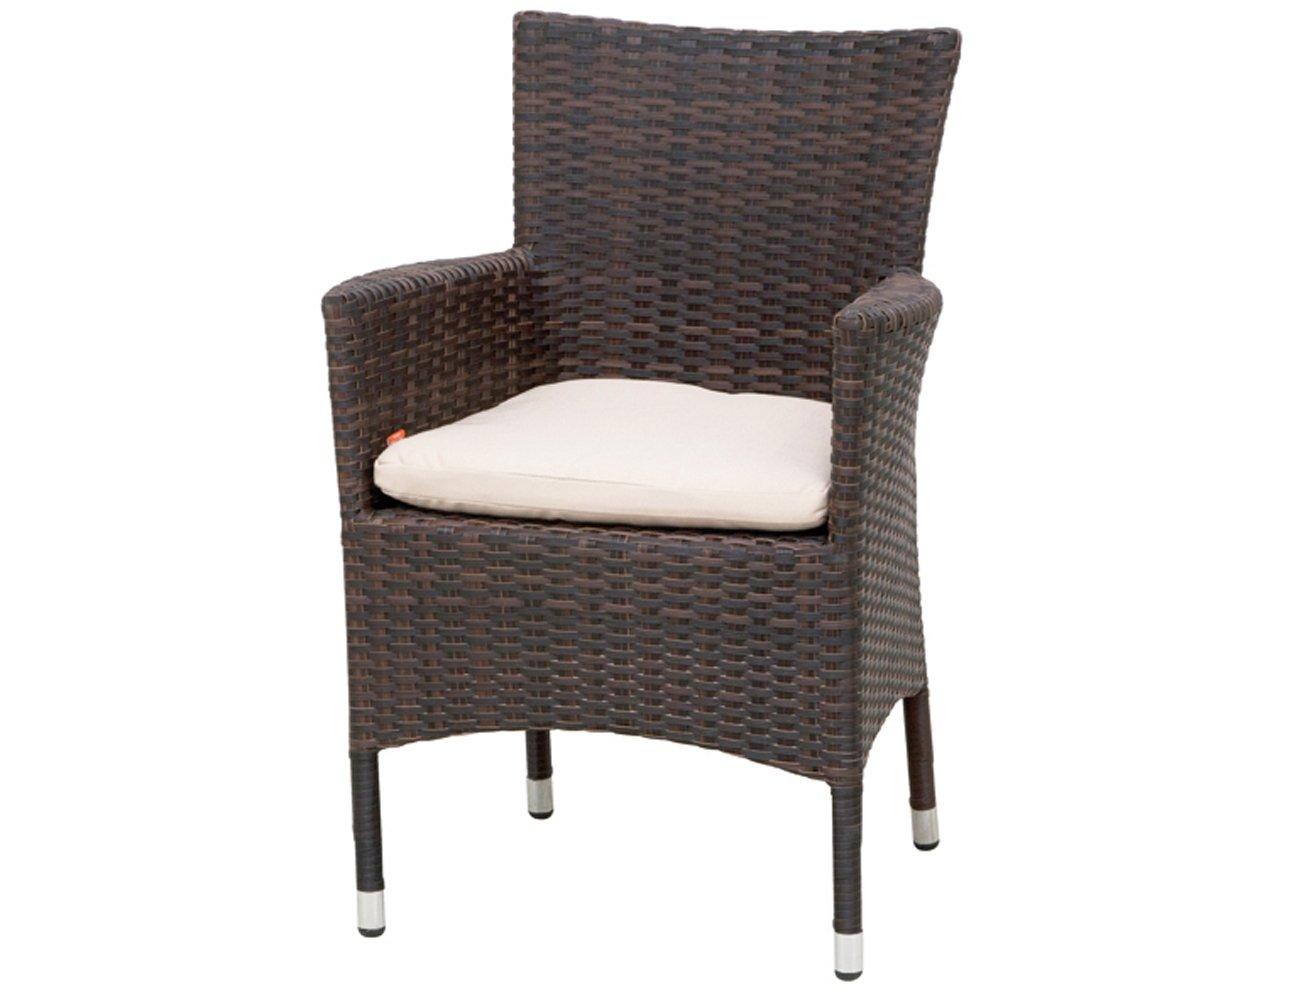 Siena Garden 801432 Sessel Bern Aluminium-Gestell Gardino®-Geflecht maron inkl. Kissen beige, Aluminium-Fußkappen